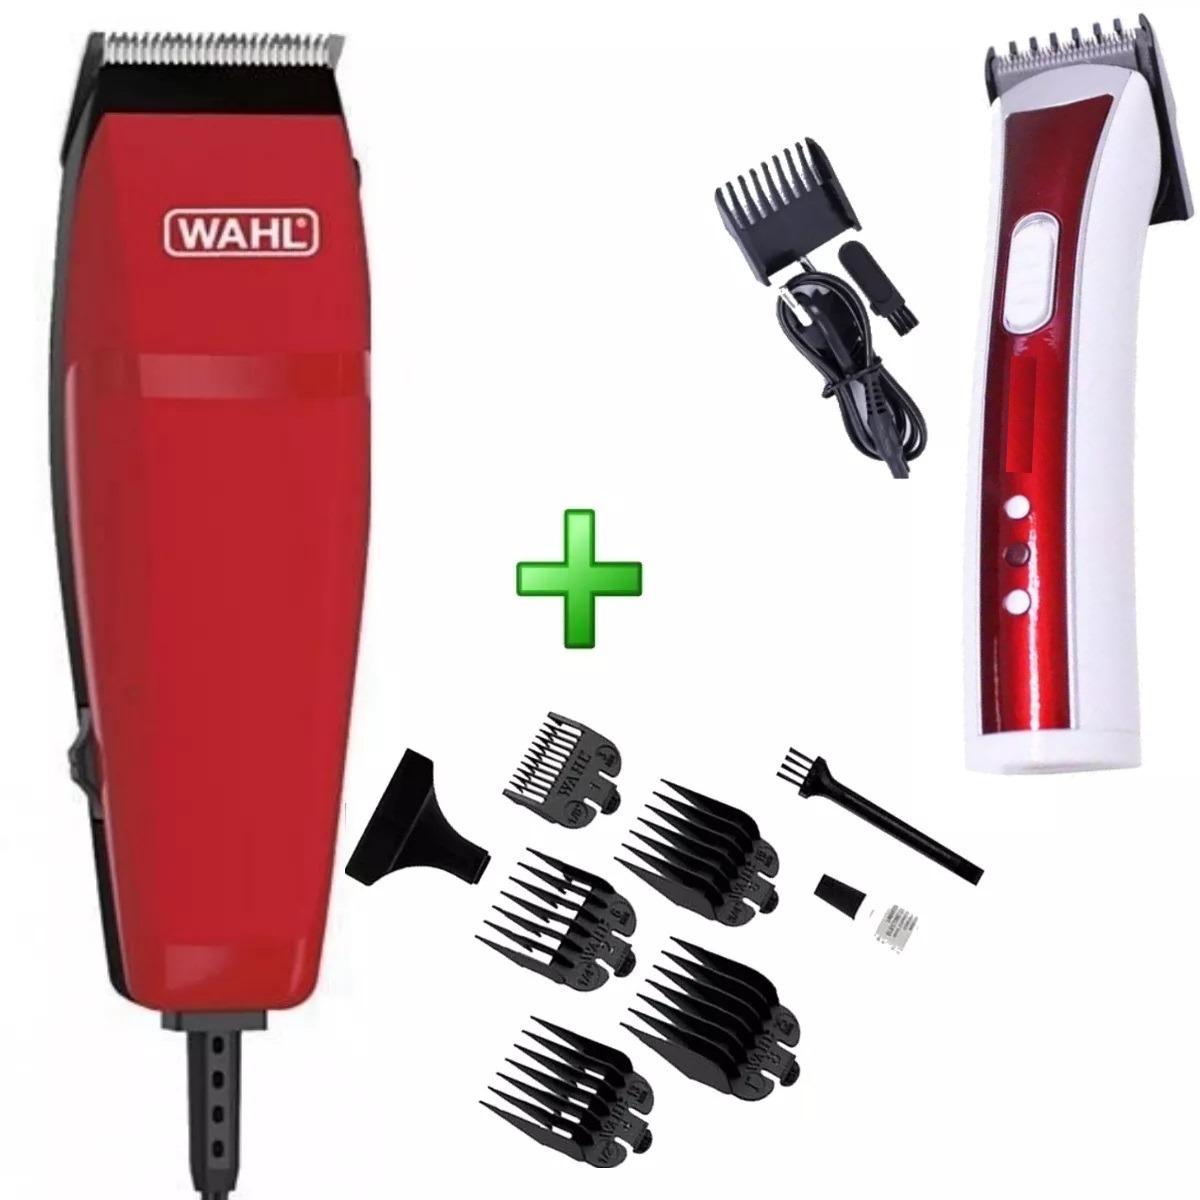 37421f6c7 cortador de cabelo wahl vr + maquina acabamento aparador. Carregando zoom.